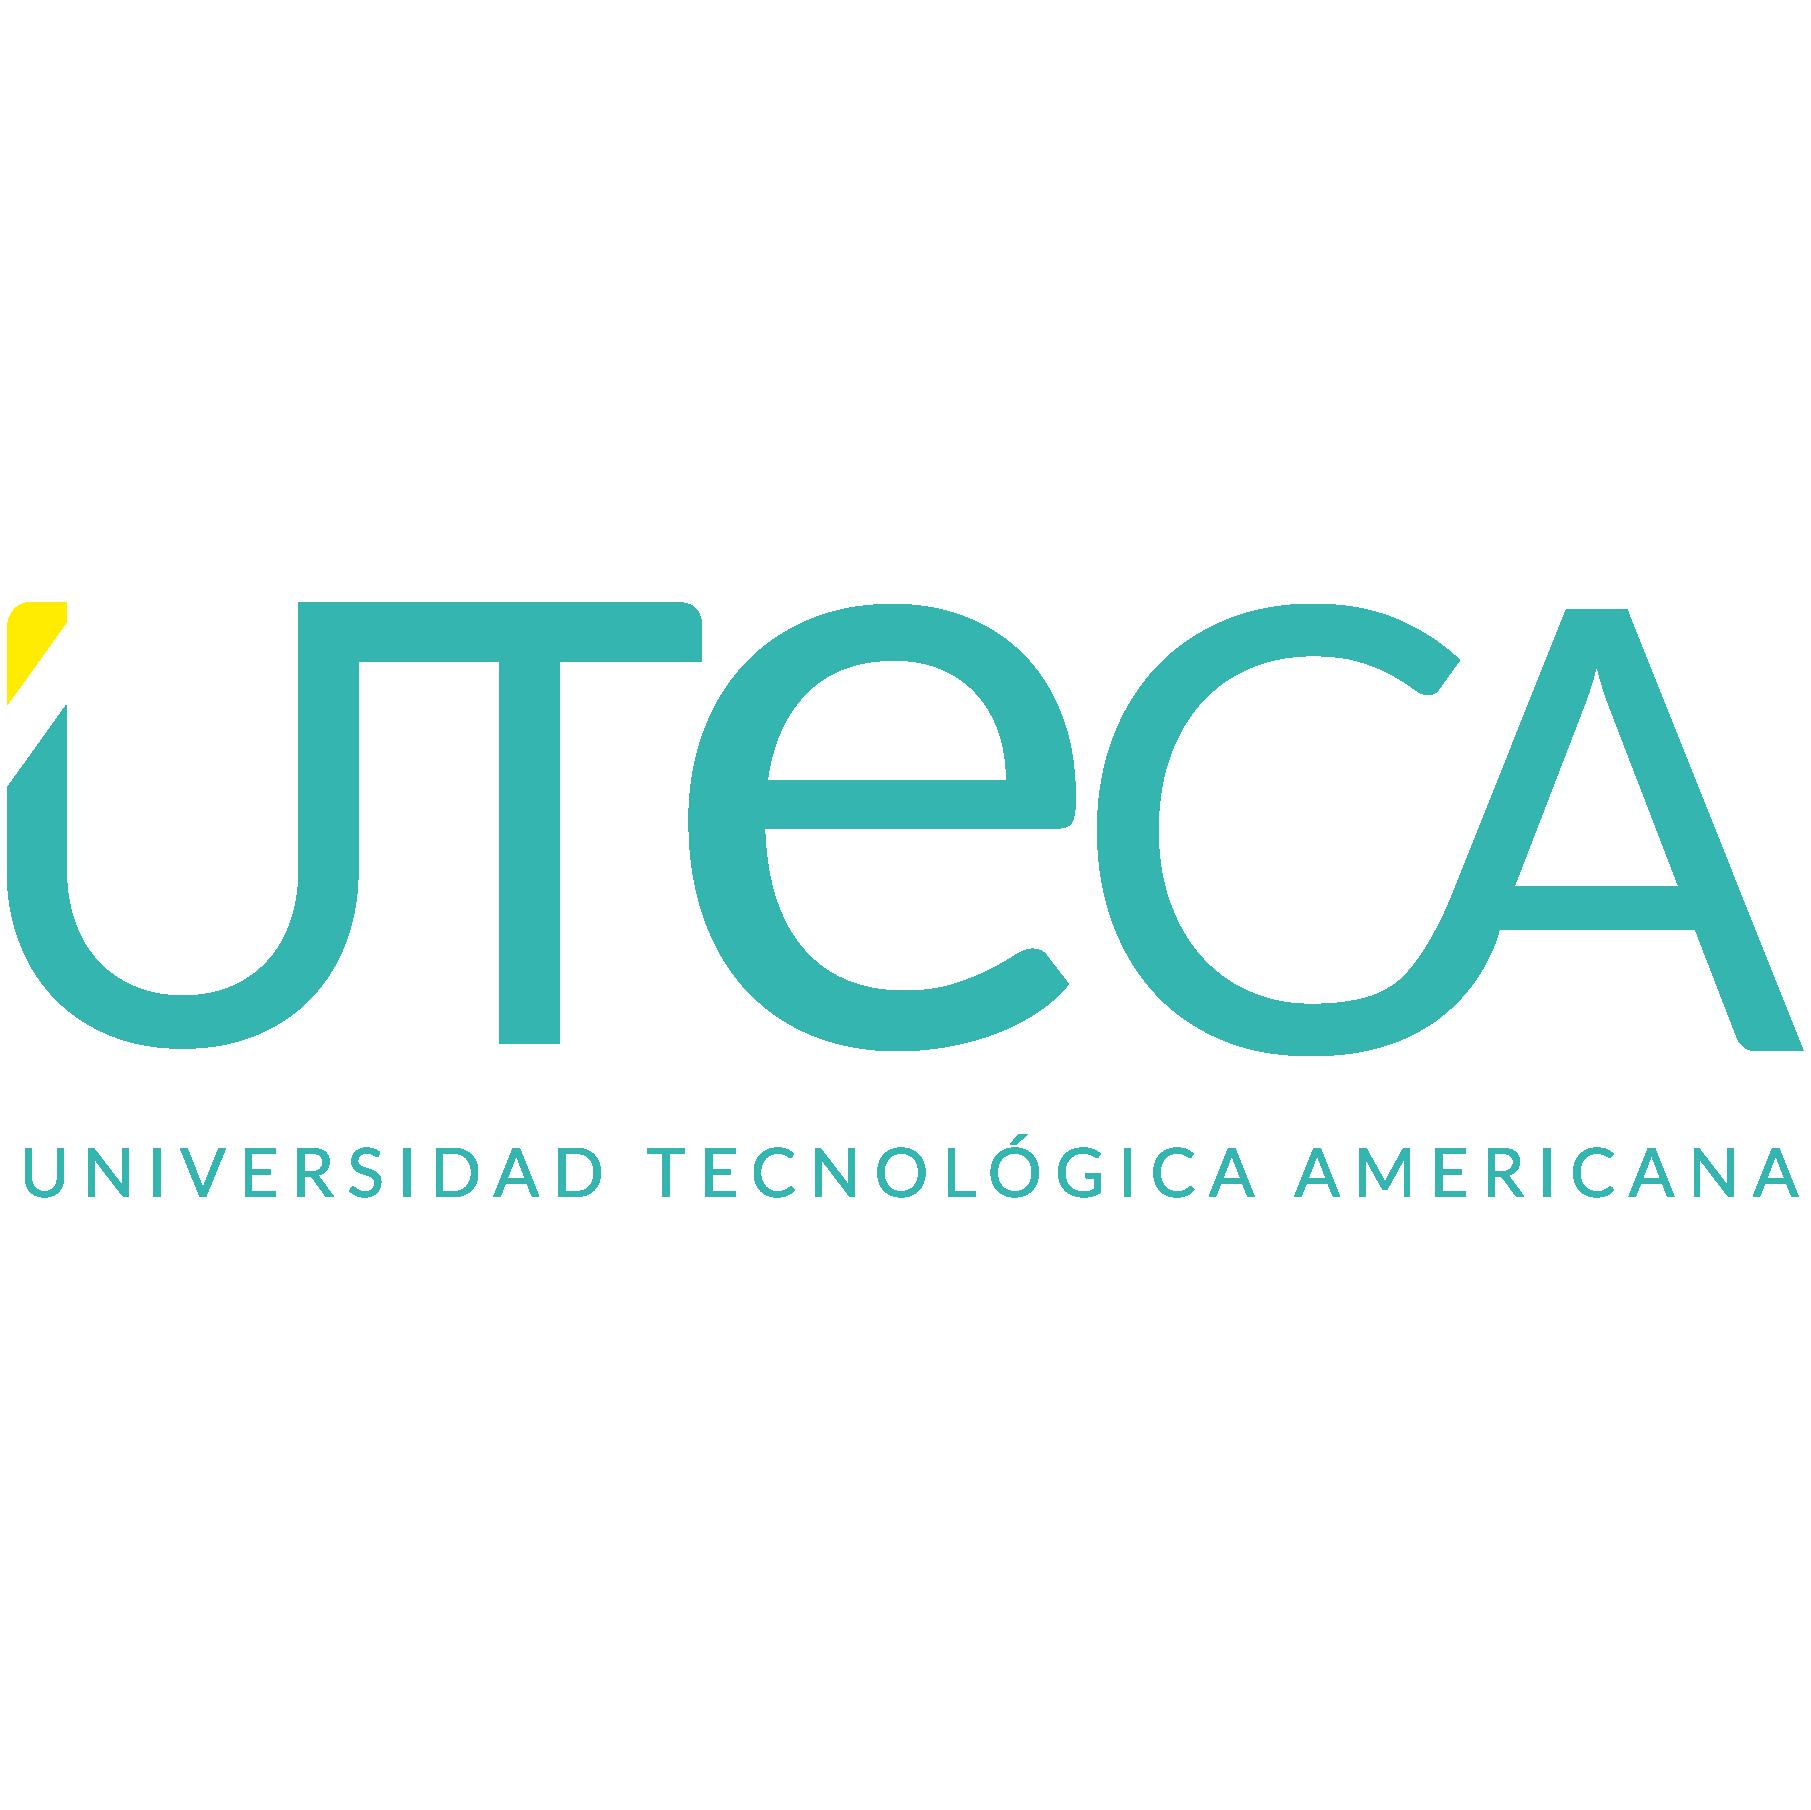 Universidad Tecnológica Americana UTECA